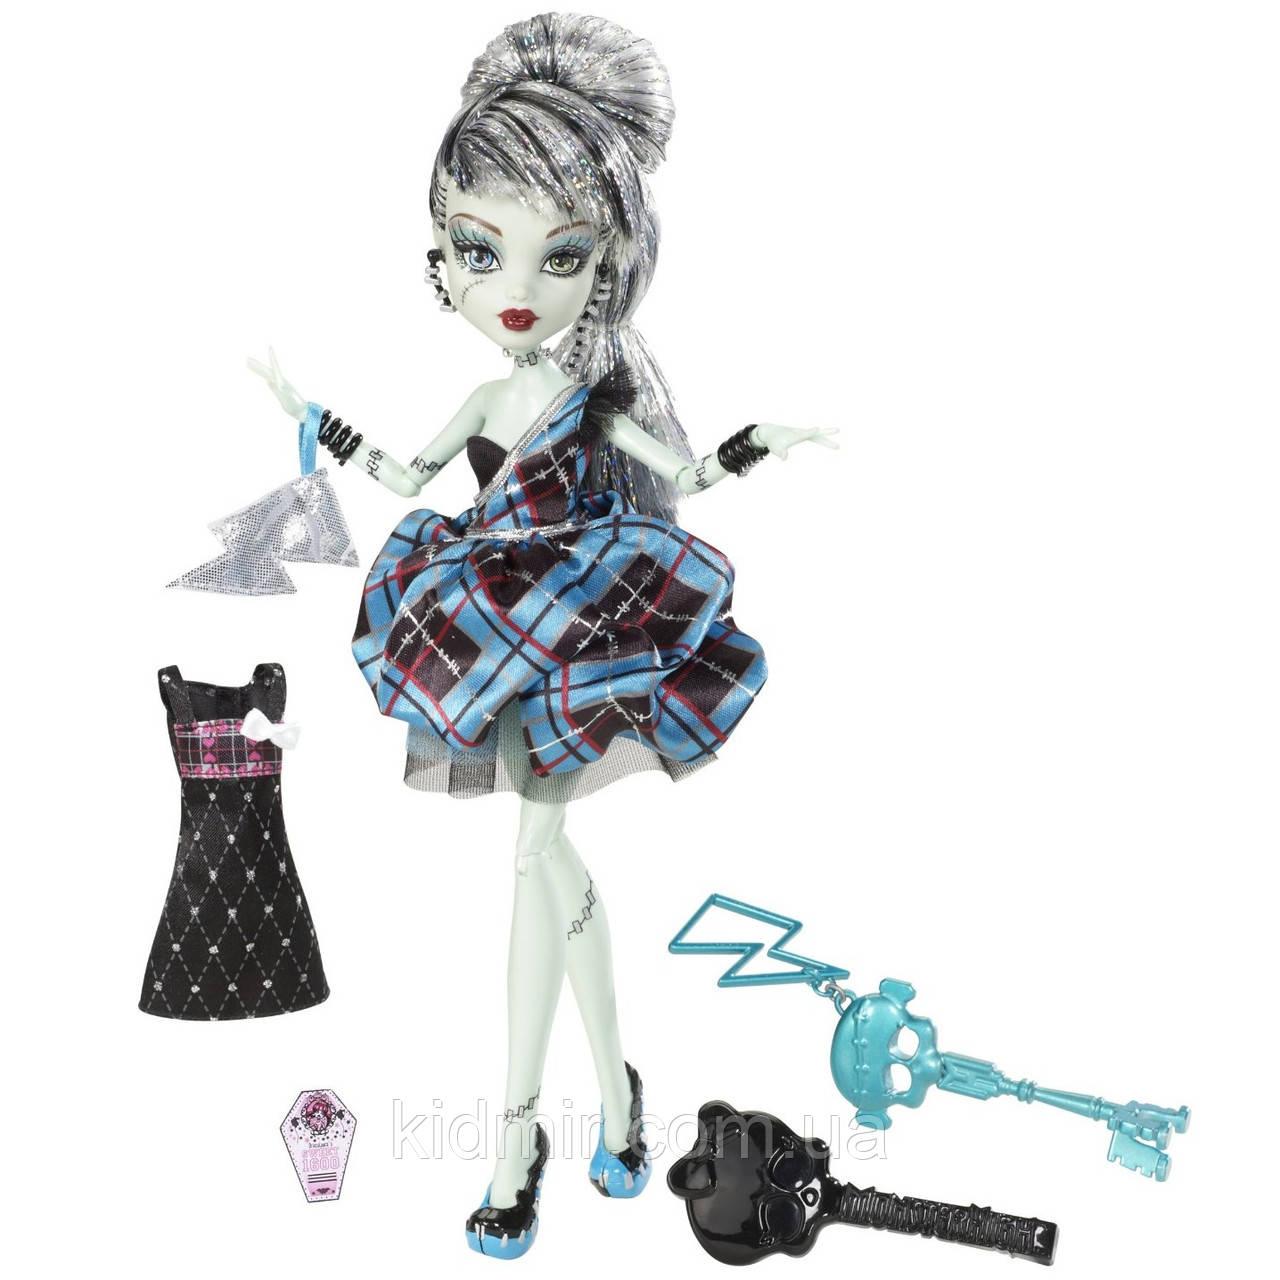 Кукла Monster High Фрэнки Штейн (Frankie Stein) из серии Sweet 1600 Монстр Хай